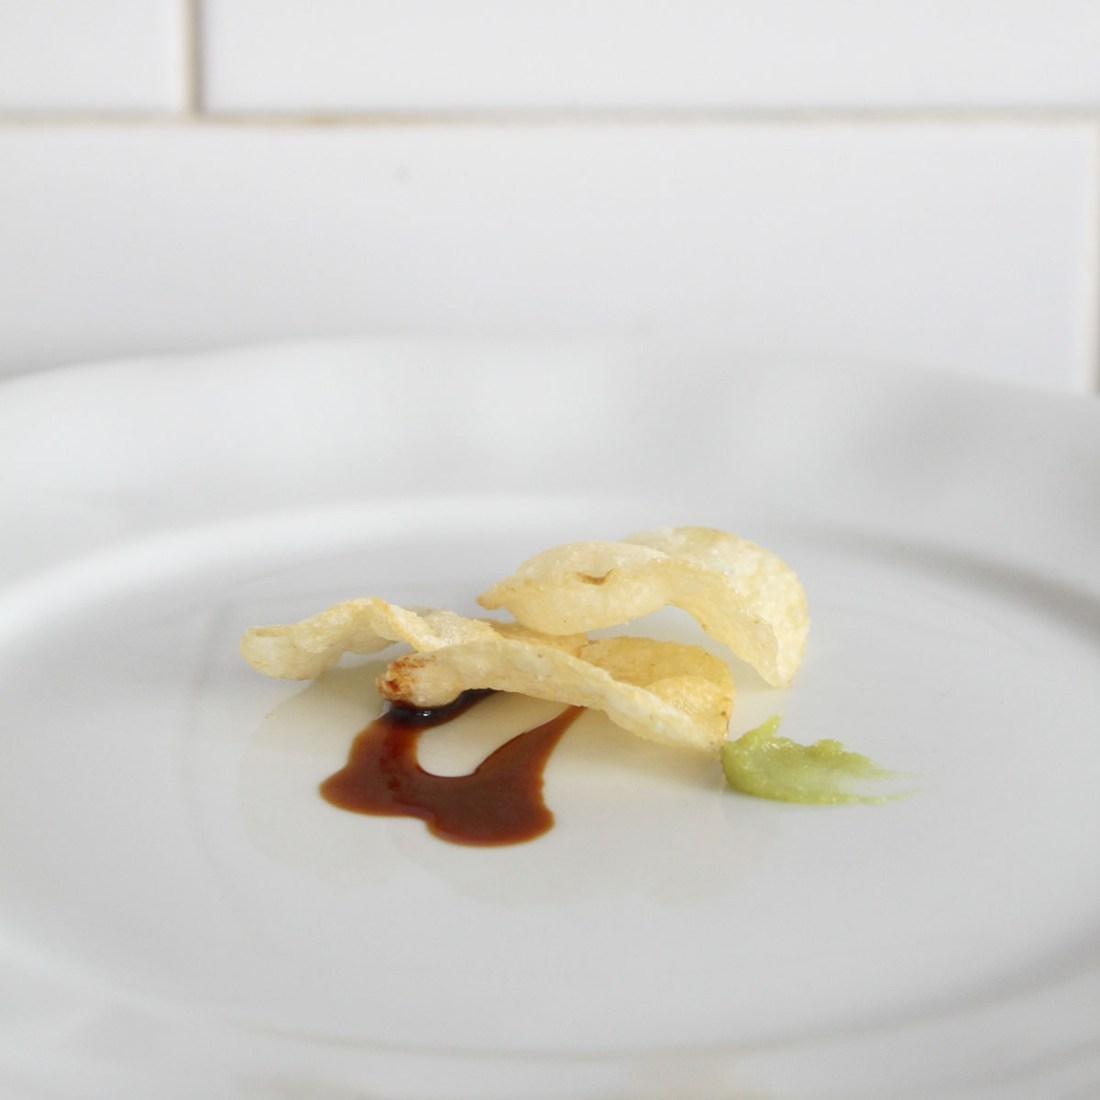 Deep Fried Wasabi Sliced Potato